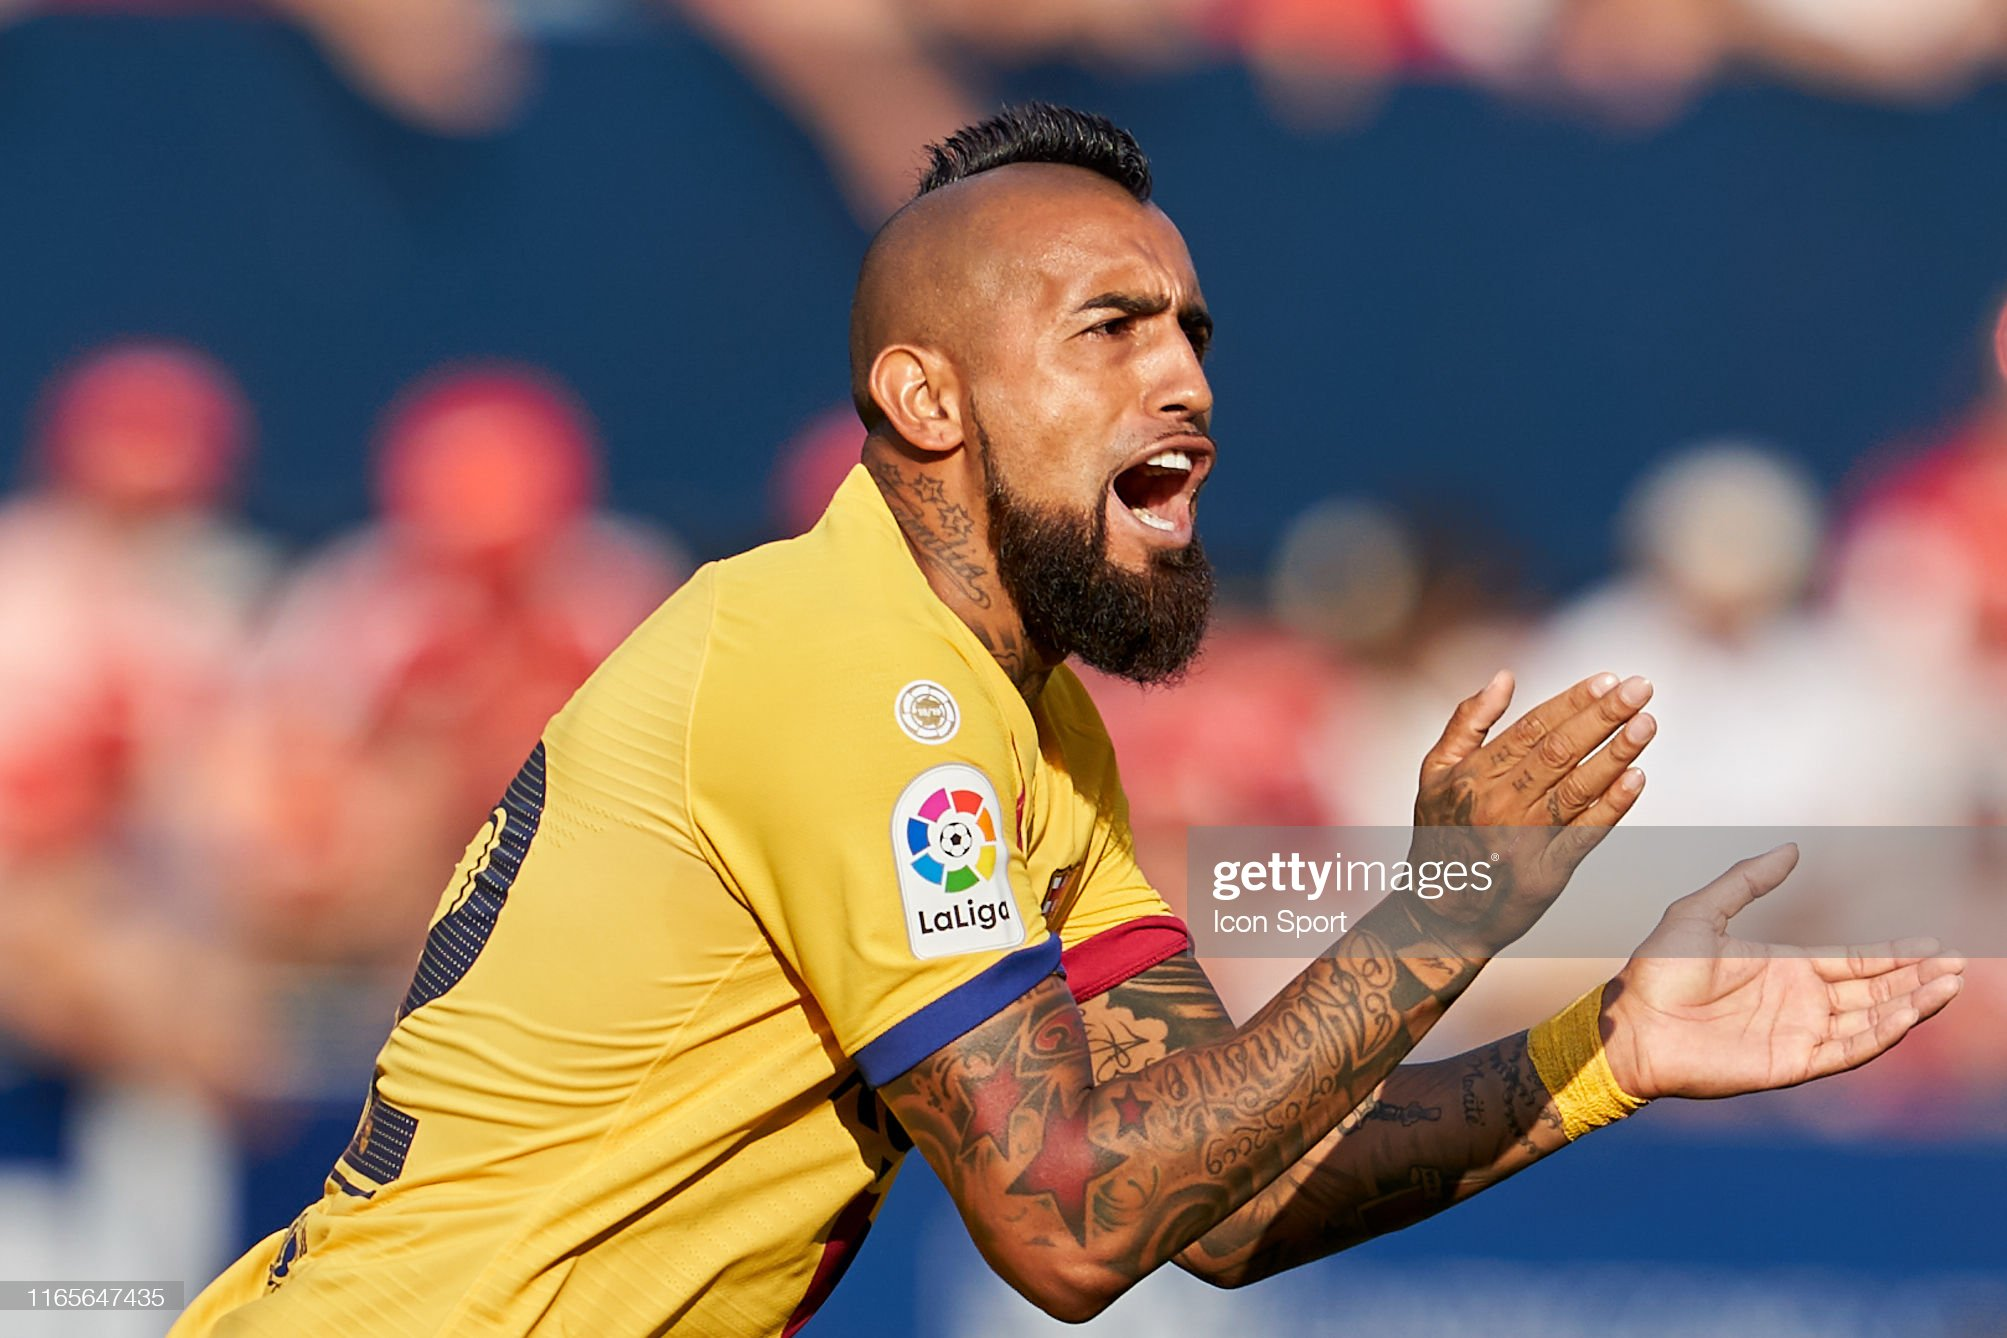 صور مباراة : أوساسونا - برشلونة 2-2 ( 31-08-2019 )  Arturo-vidal-of-fc-barcelona-during-the-liga-match-between-osasuna-picture-id1165647435?s=2048x2048